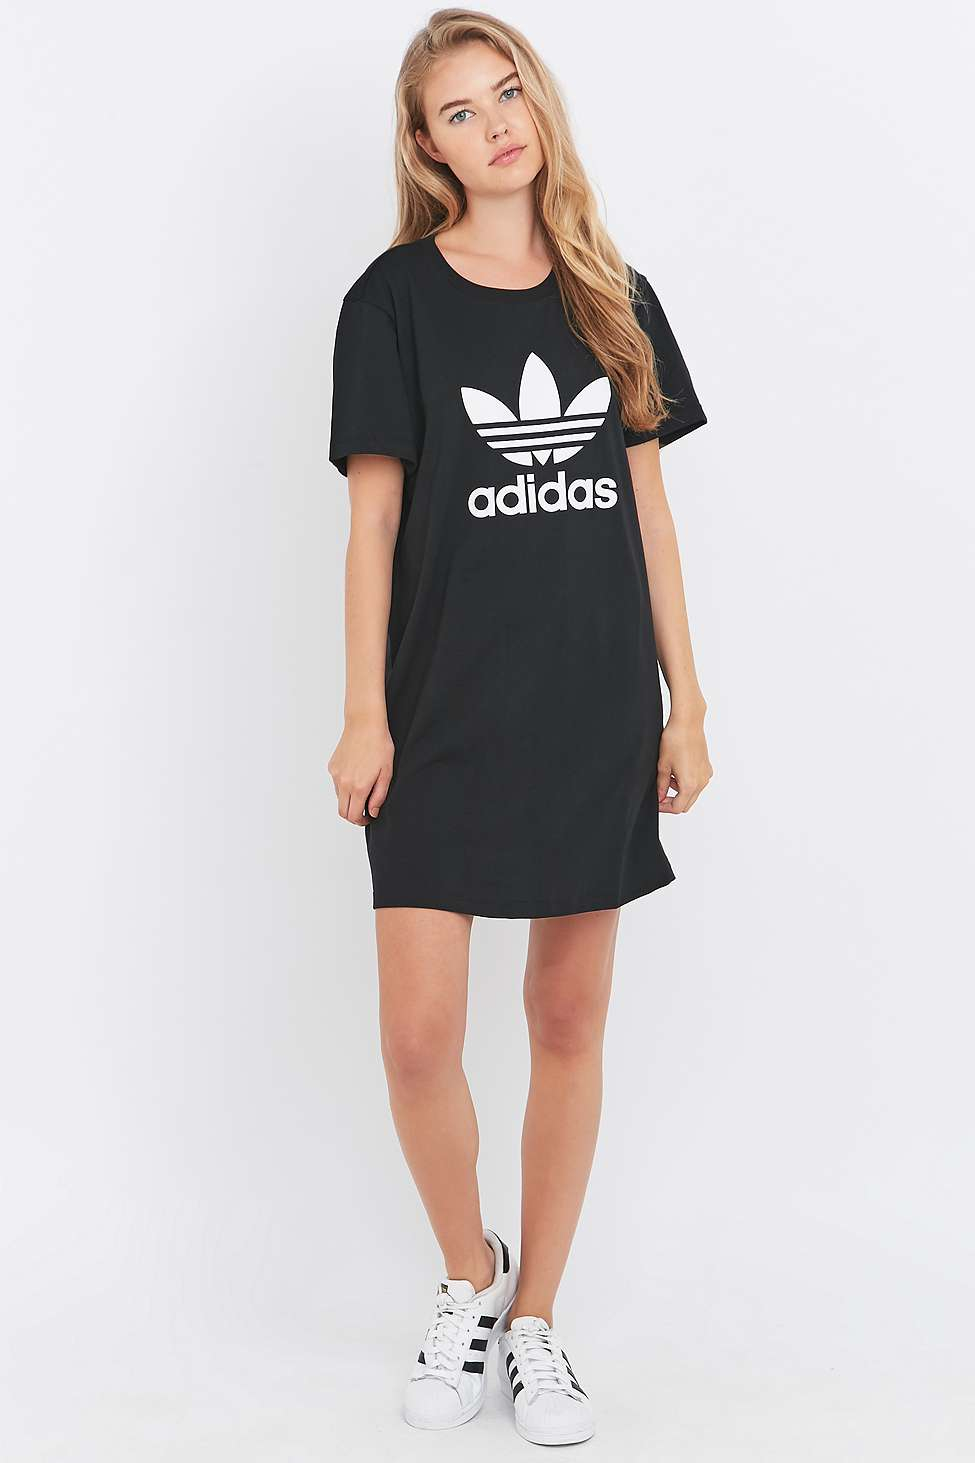 Adidas originals Black Trefoil T-shirt Dress in Black | Lyst